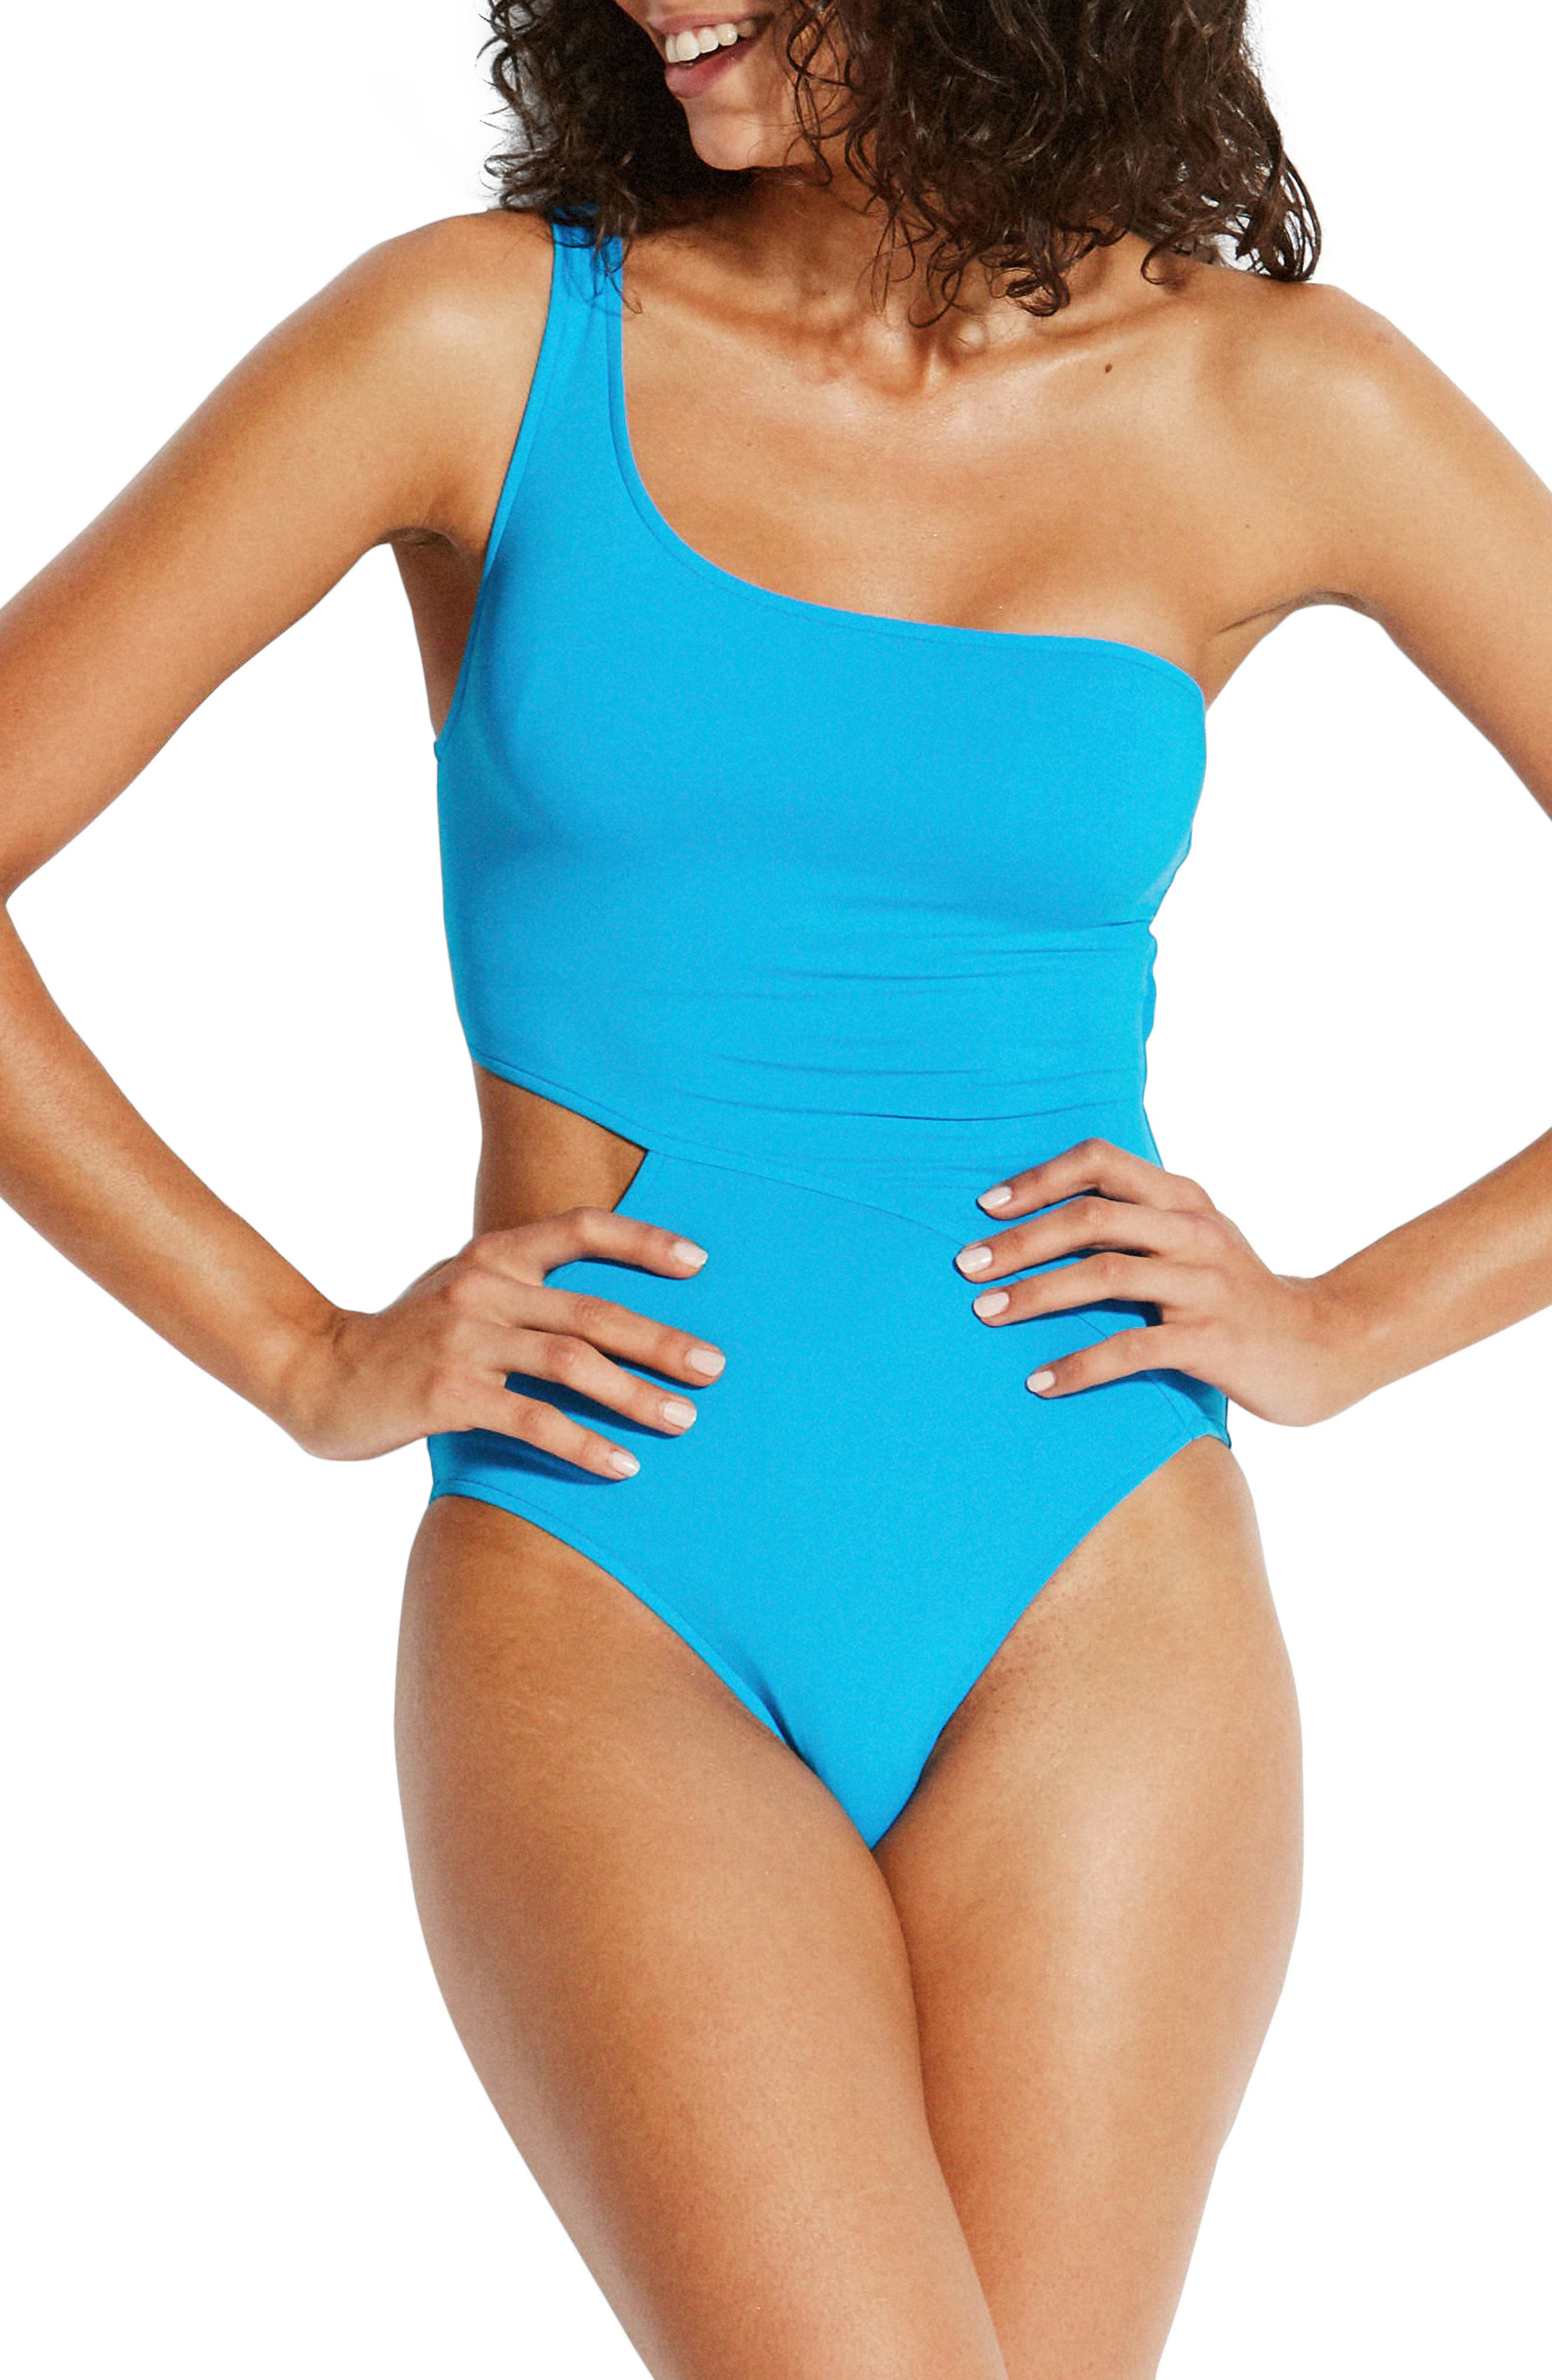 Seafolly Active One-Shoulder One-Piece Swimsuit, US / 14 AU - Blue